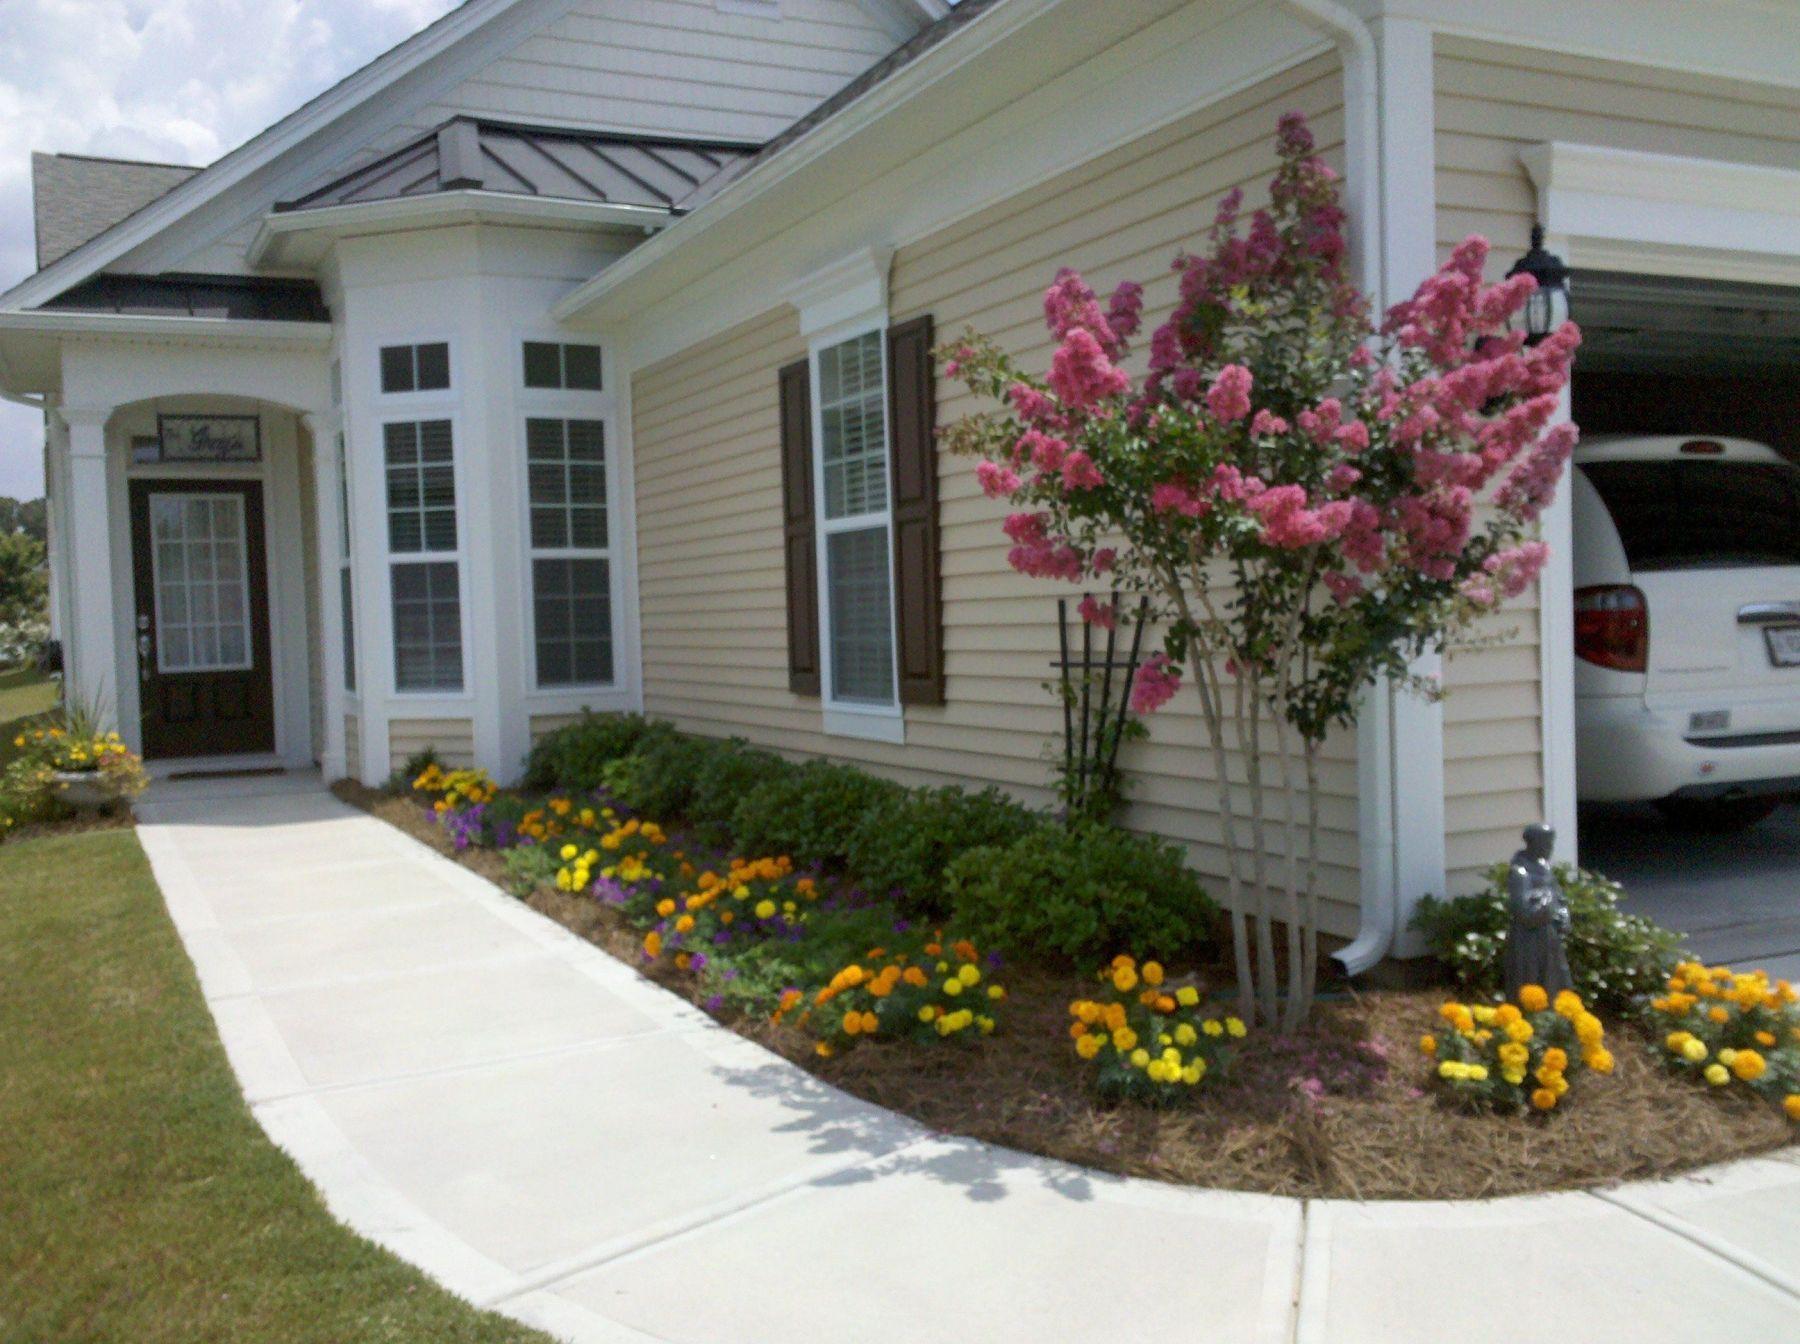 44+ Front lawn flower bed ideas ideas